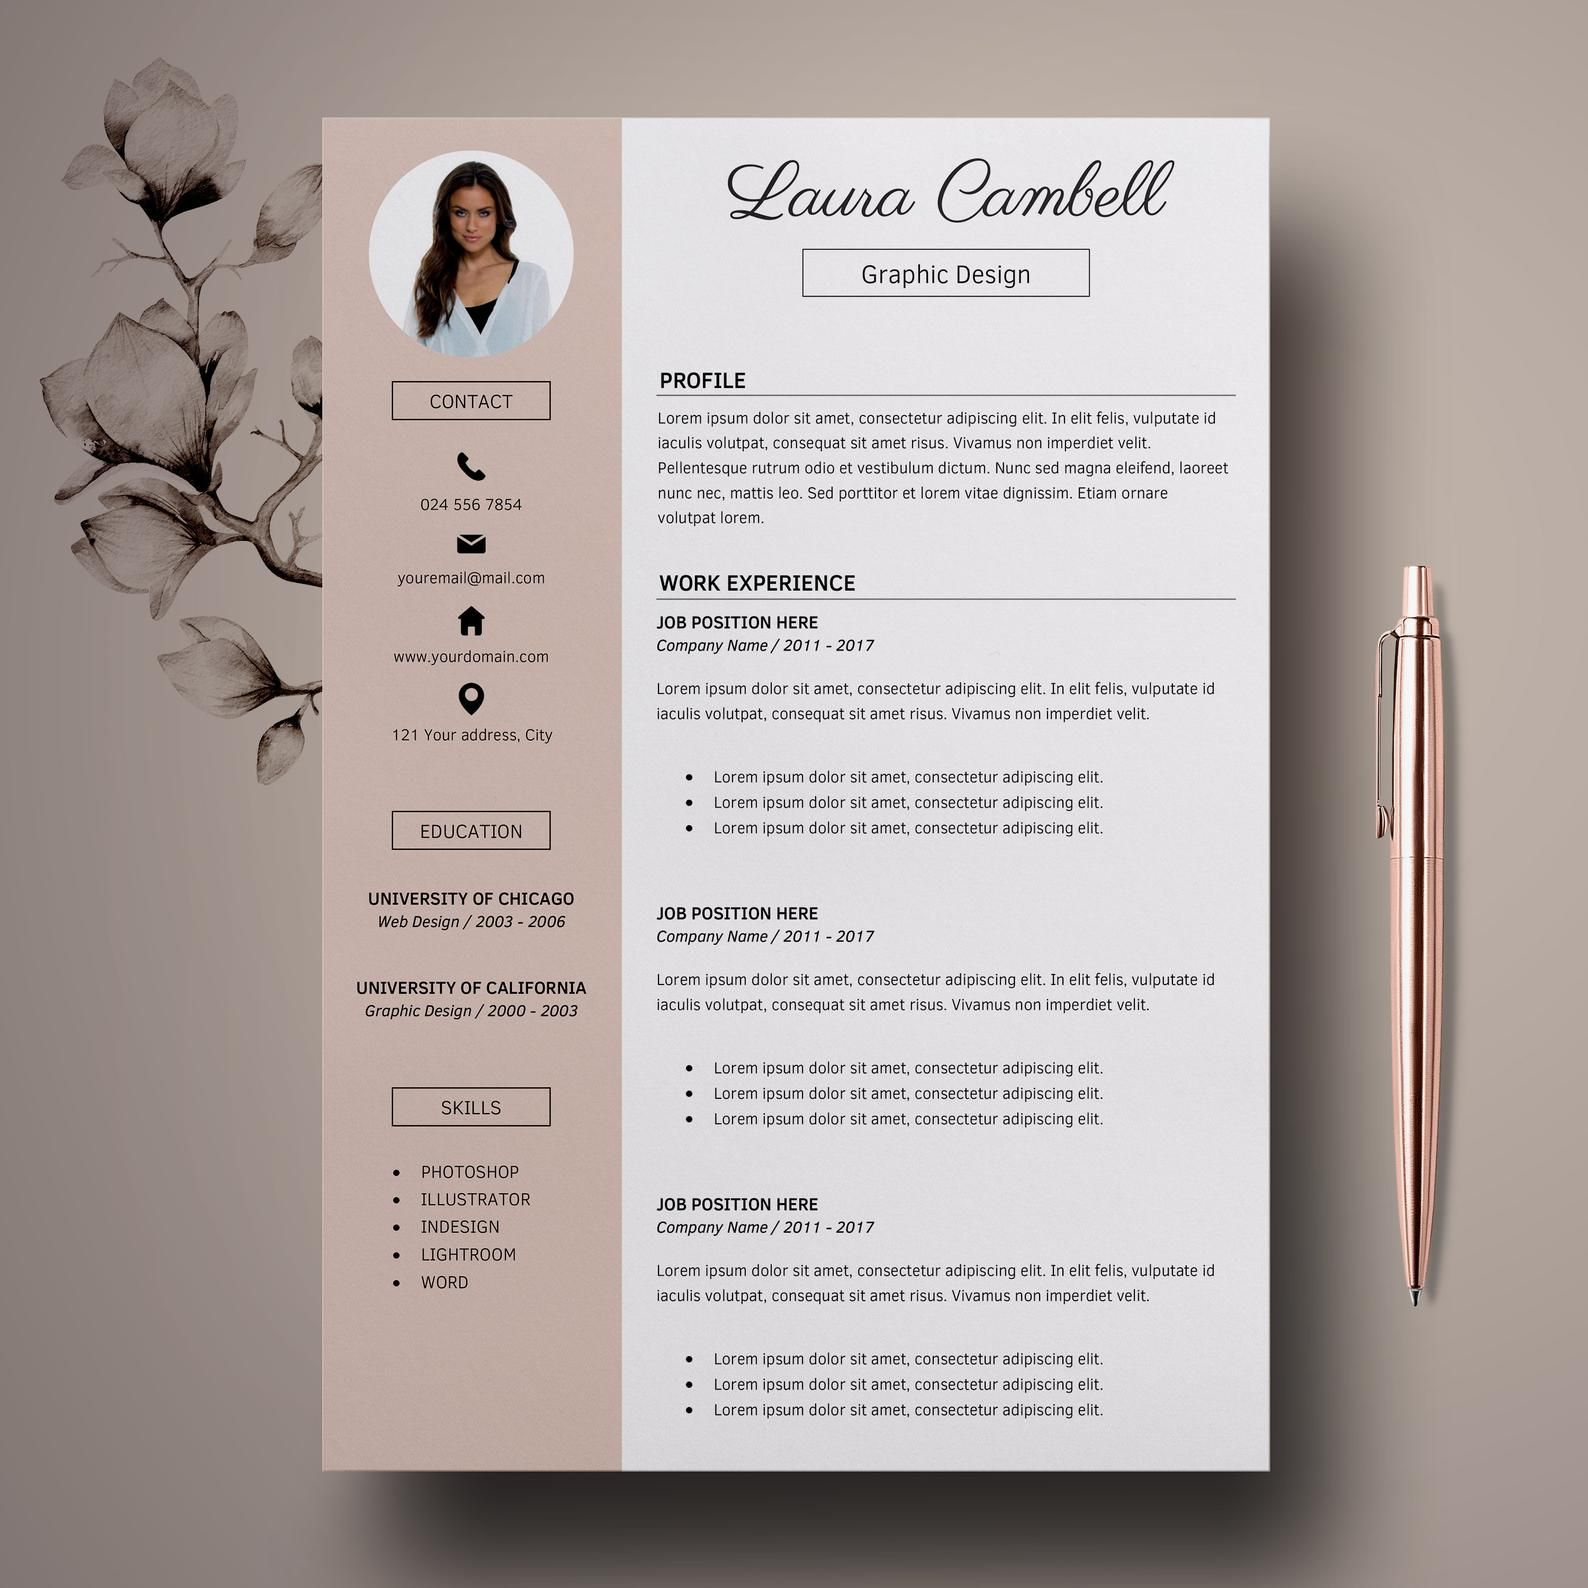 Modern Resume Template Cv Template For Ms Word Professional Resume Design Resume Cover Letter Resume Instant Download Lebenslauf Design Lebenslaufvorlage Lebenslauf